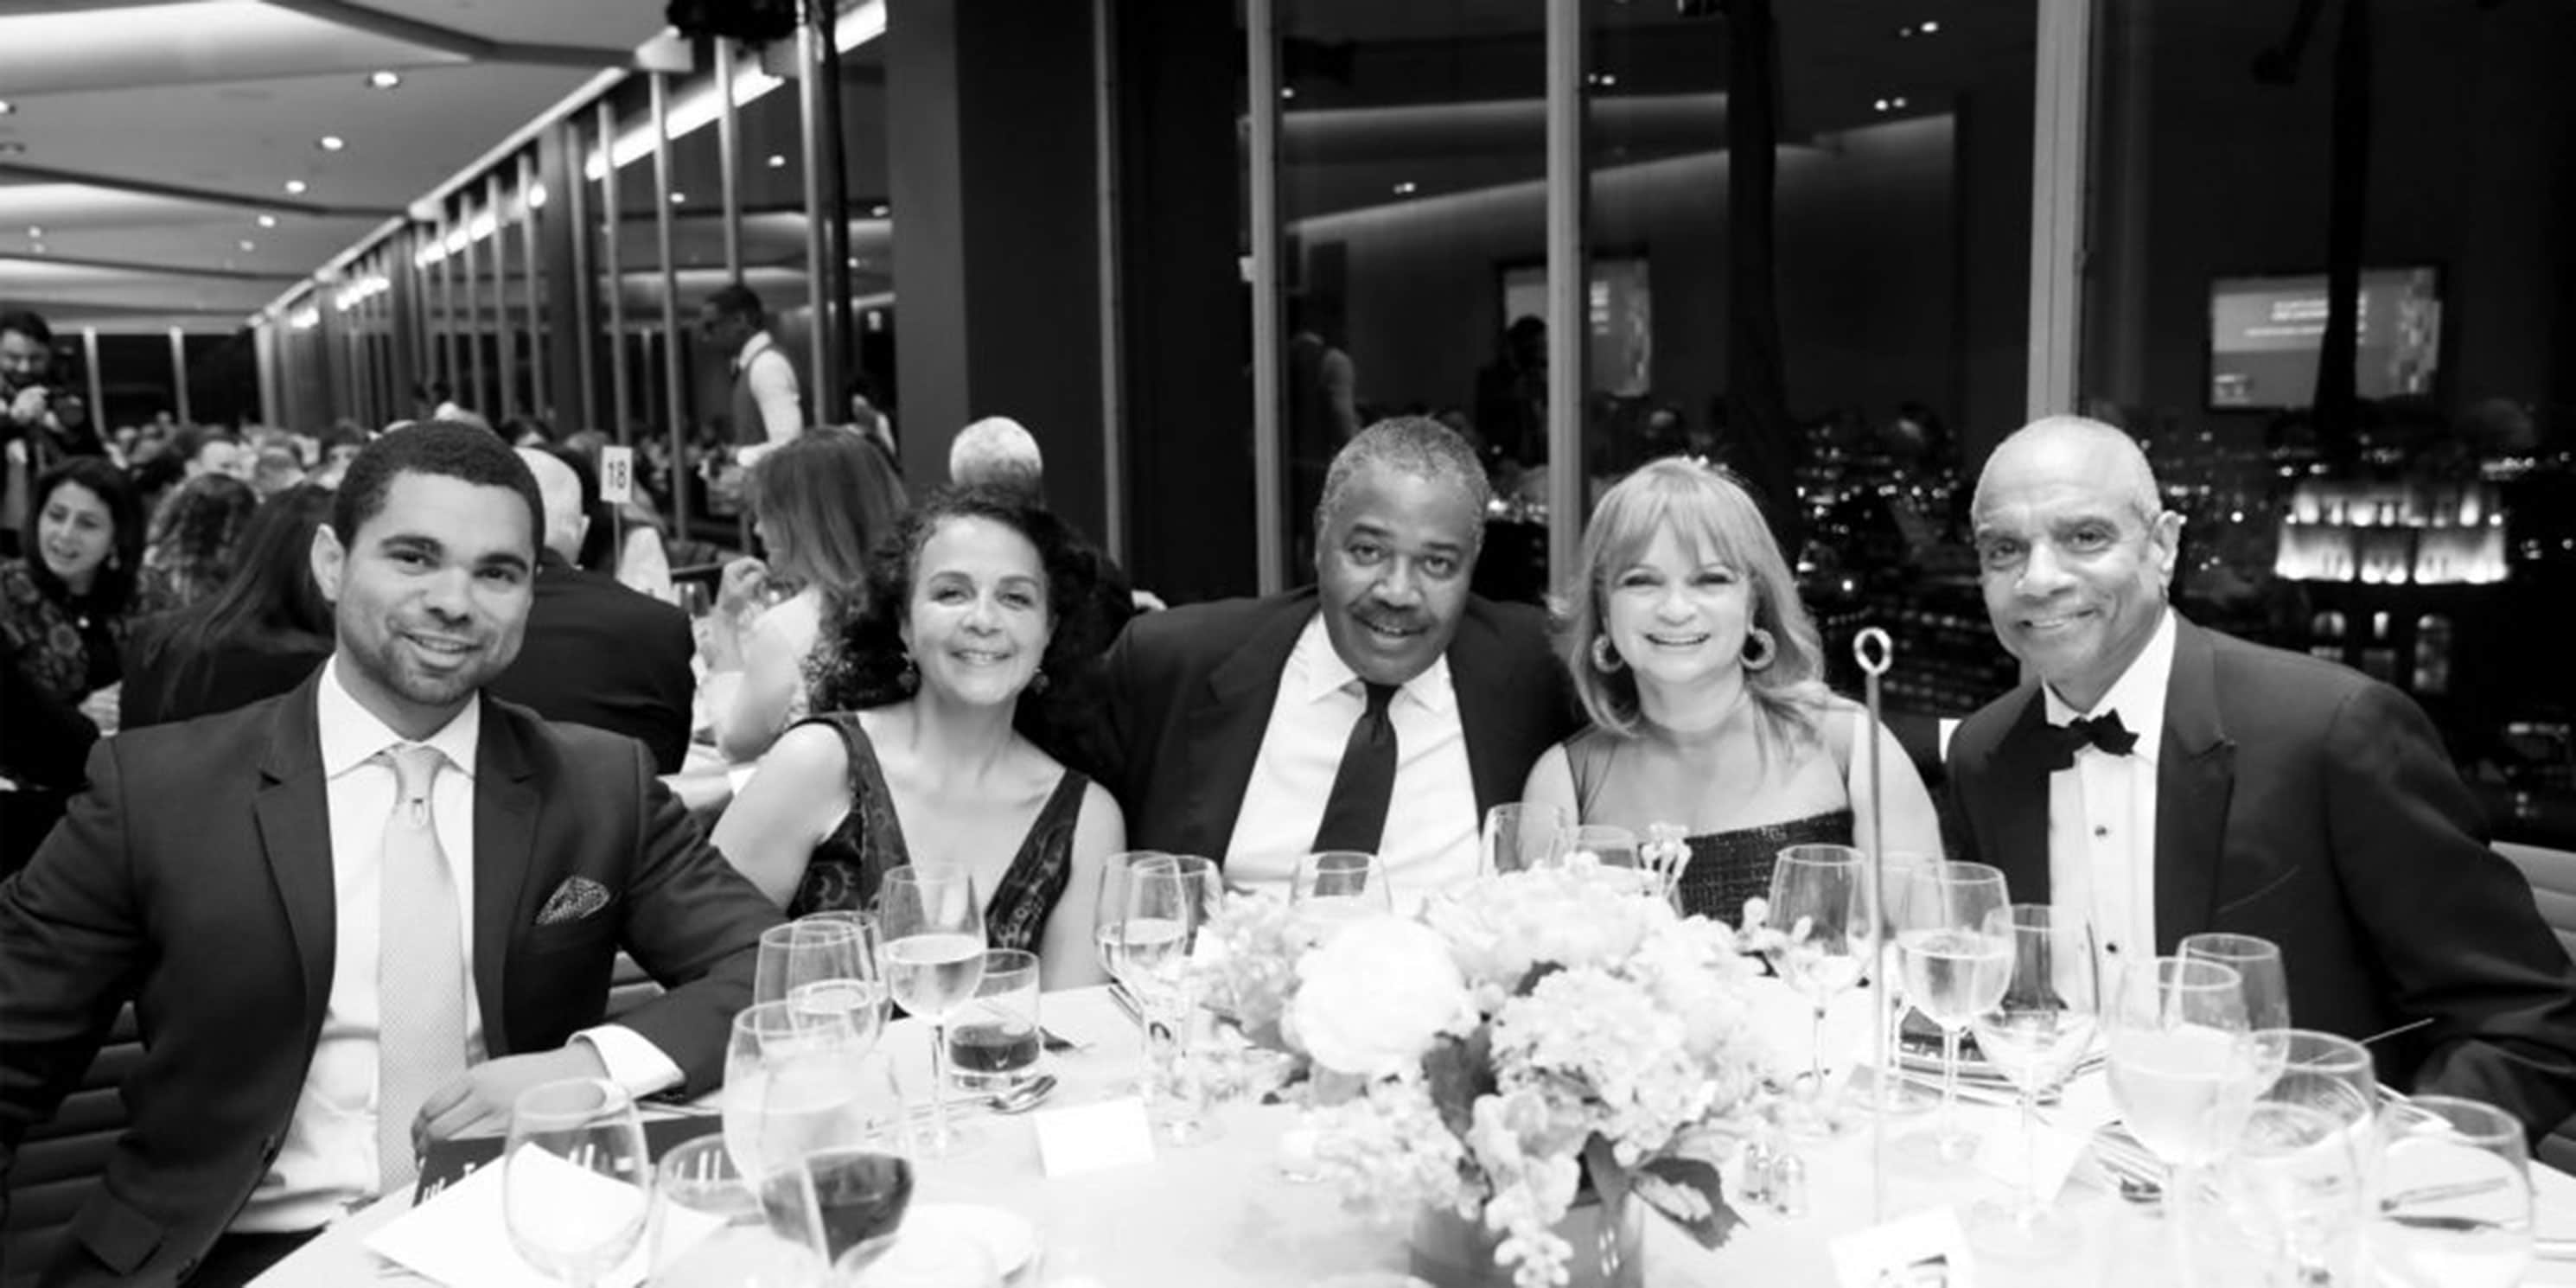 Kevin Chenault, Carol Sutton Lewis, William Lewis Jr., Kathryn Chenault, & Kenneth Chenault at 2018 Gala